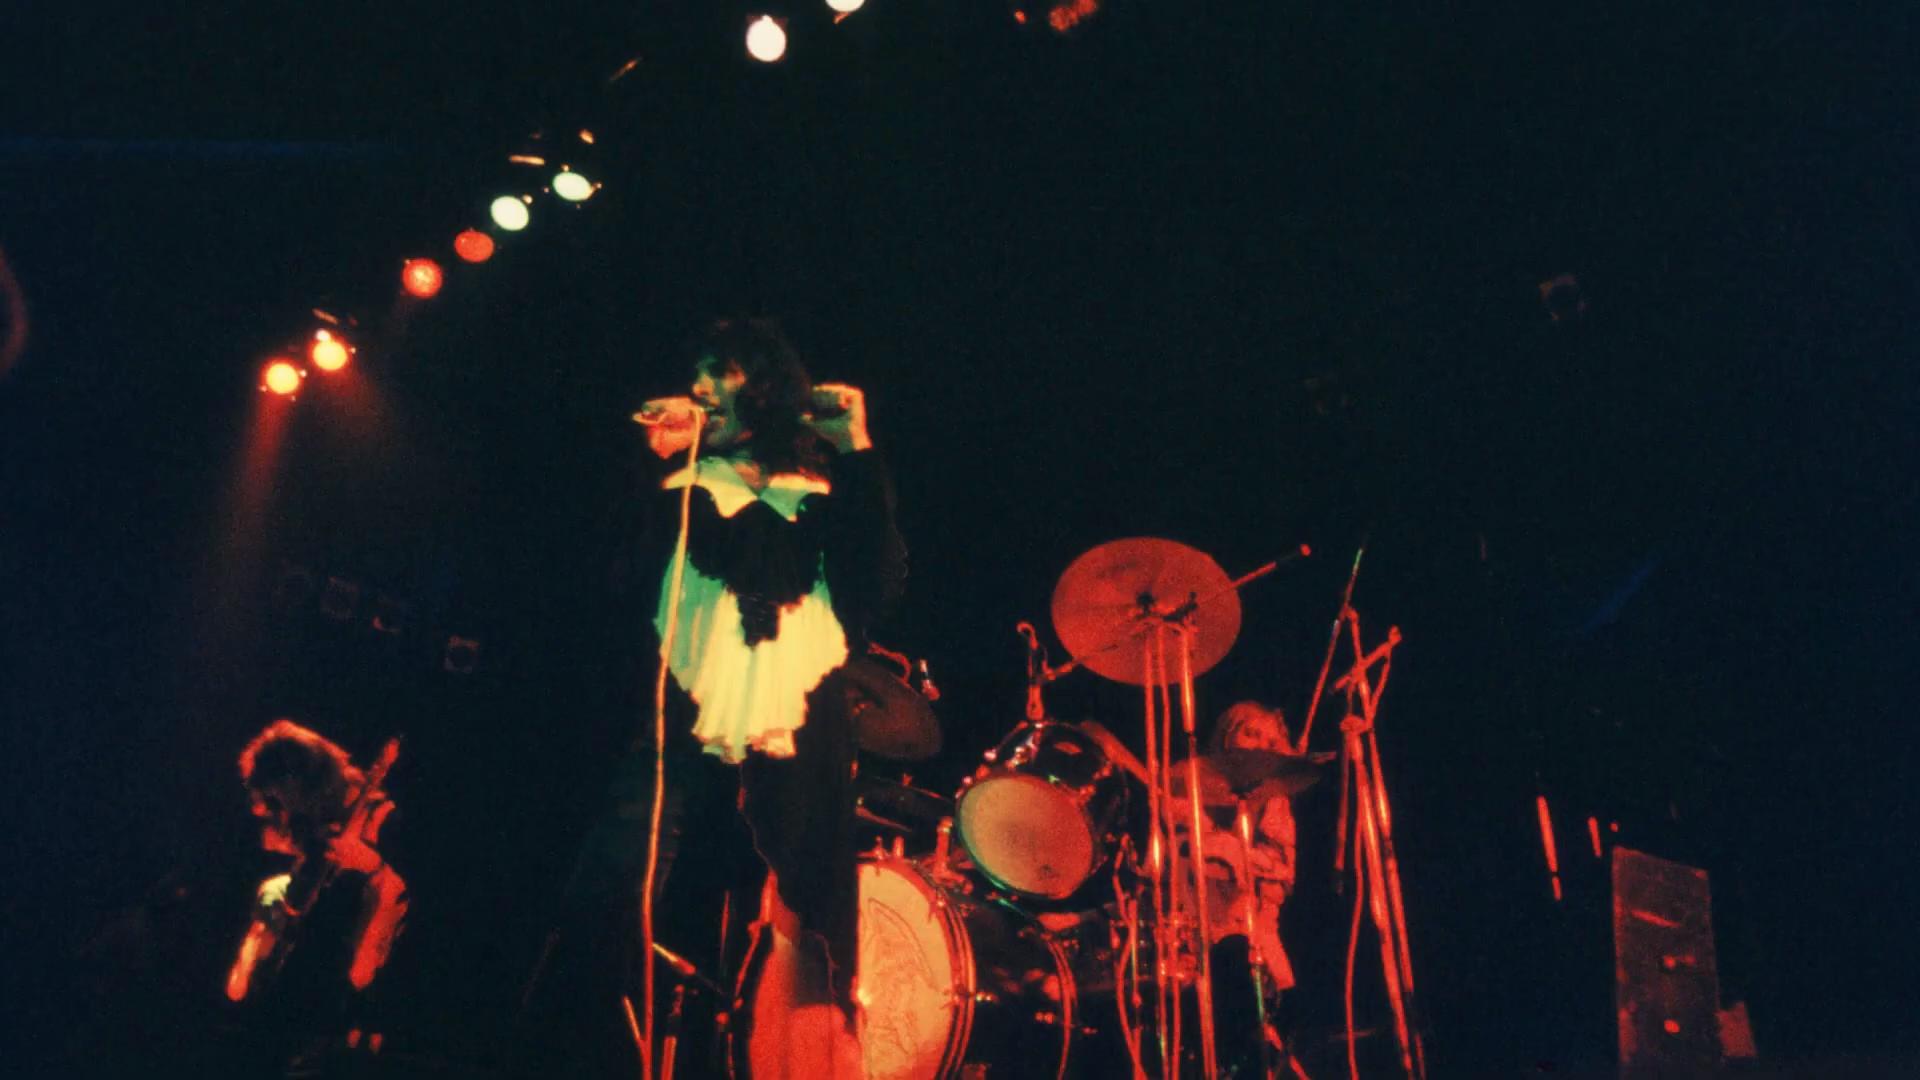 queen-rare-photo-rainbow-1974-5